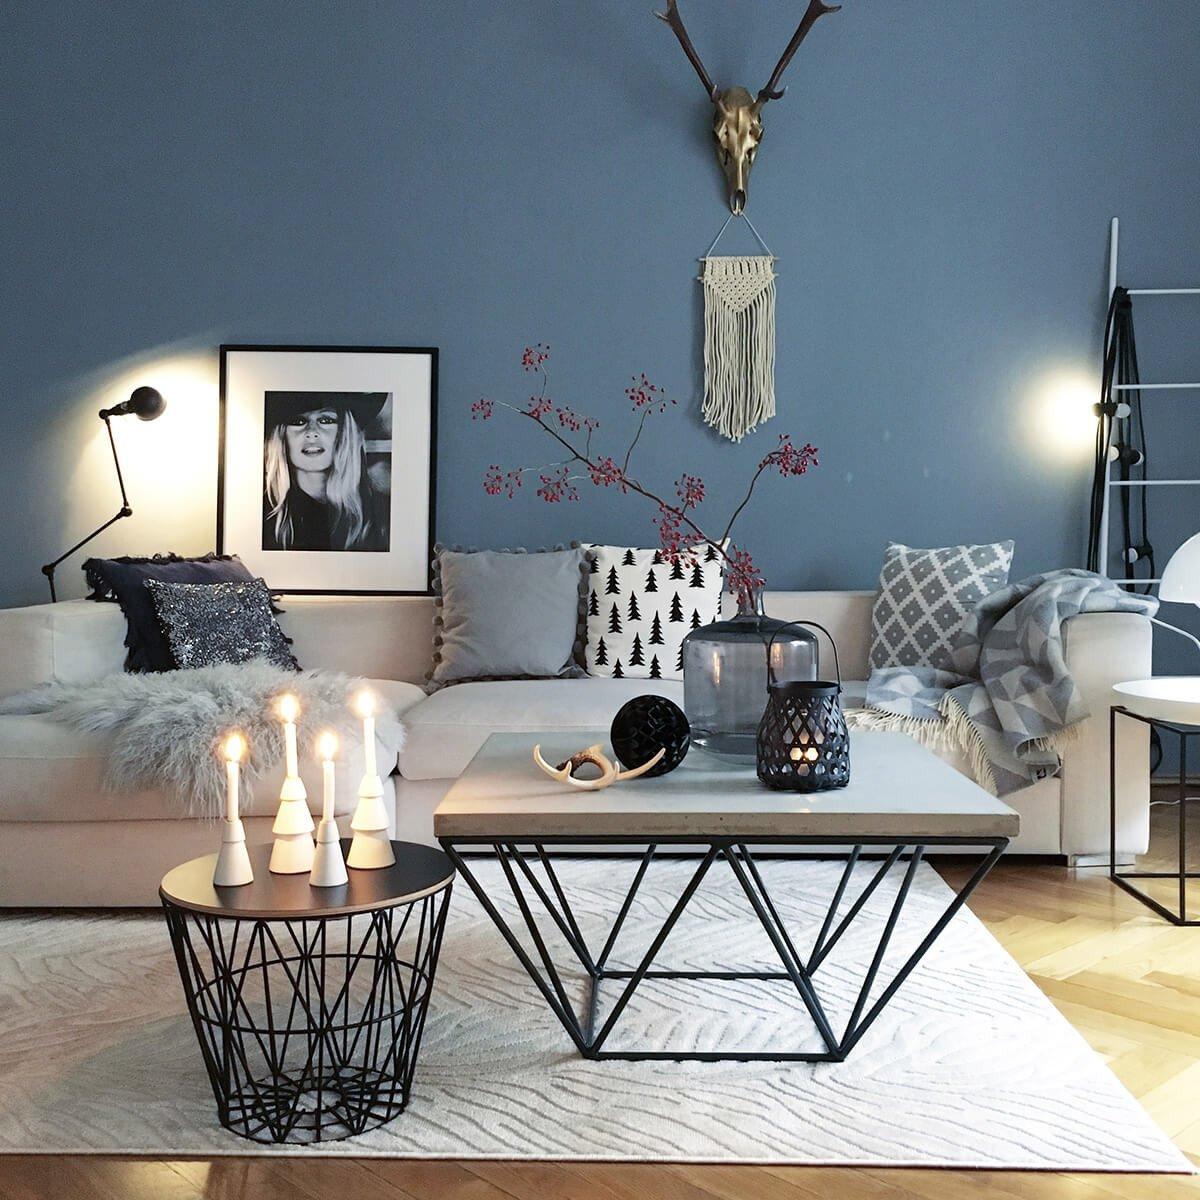 Table Decorating Ideas Living Room Elegant 37 Best Coffee Table Decorating Ideas and Designs for 2019